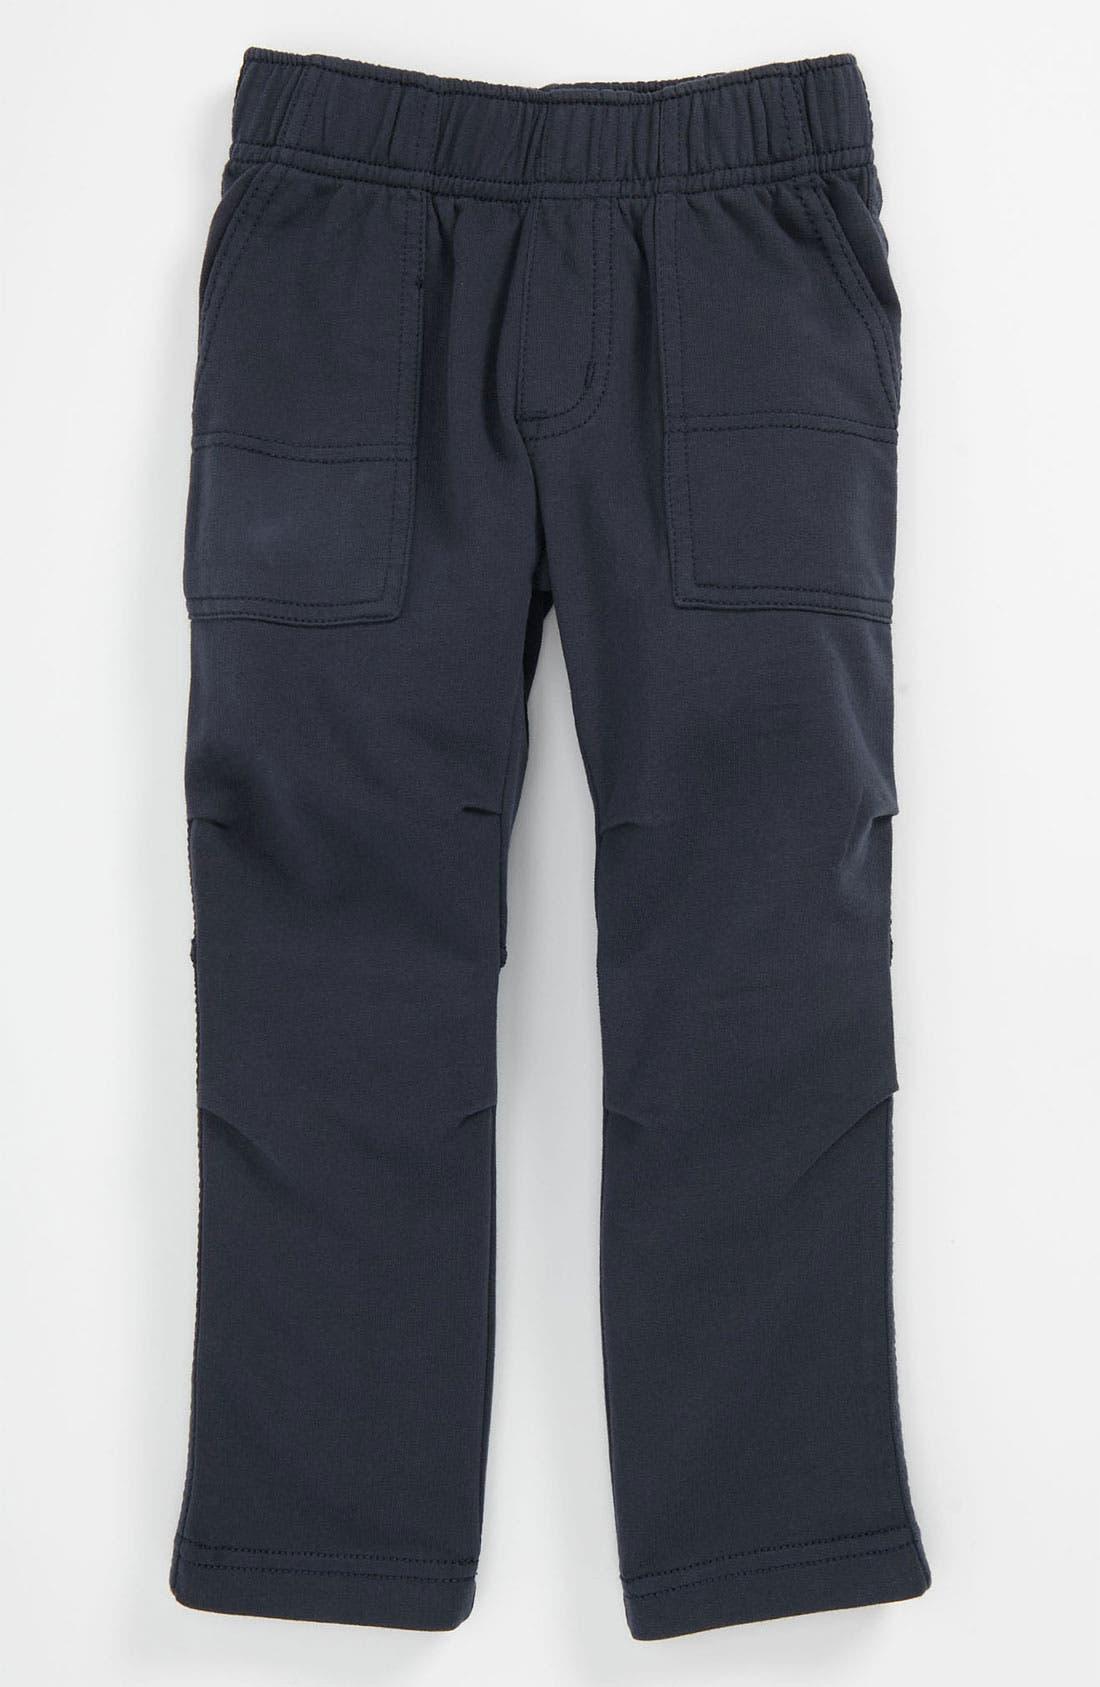 Main Image - Tea Collection Knit Pants (Toddler)